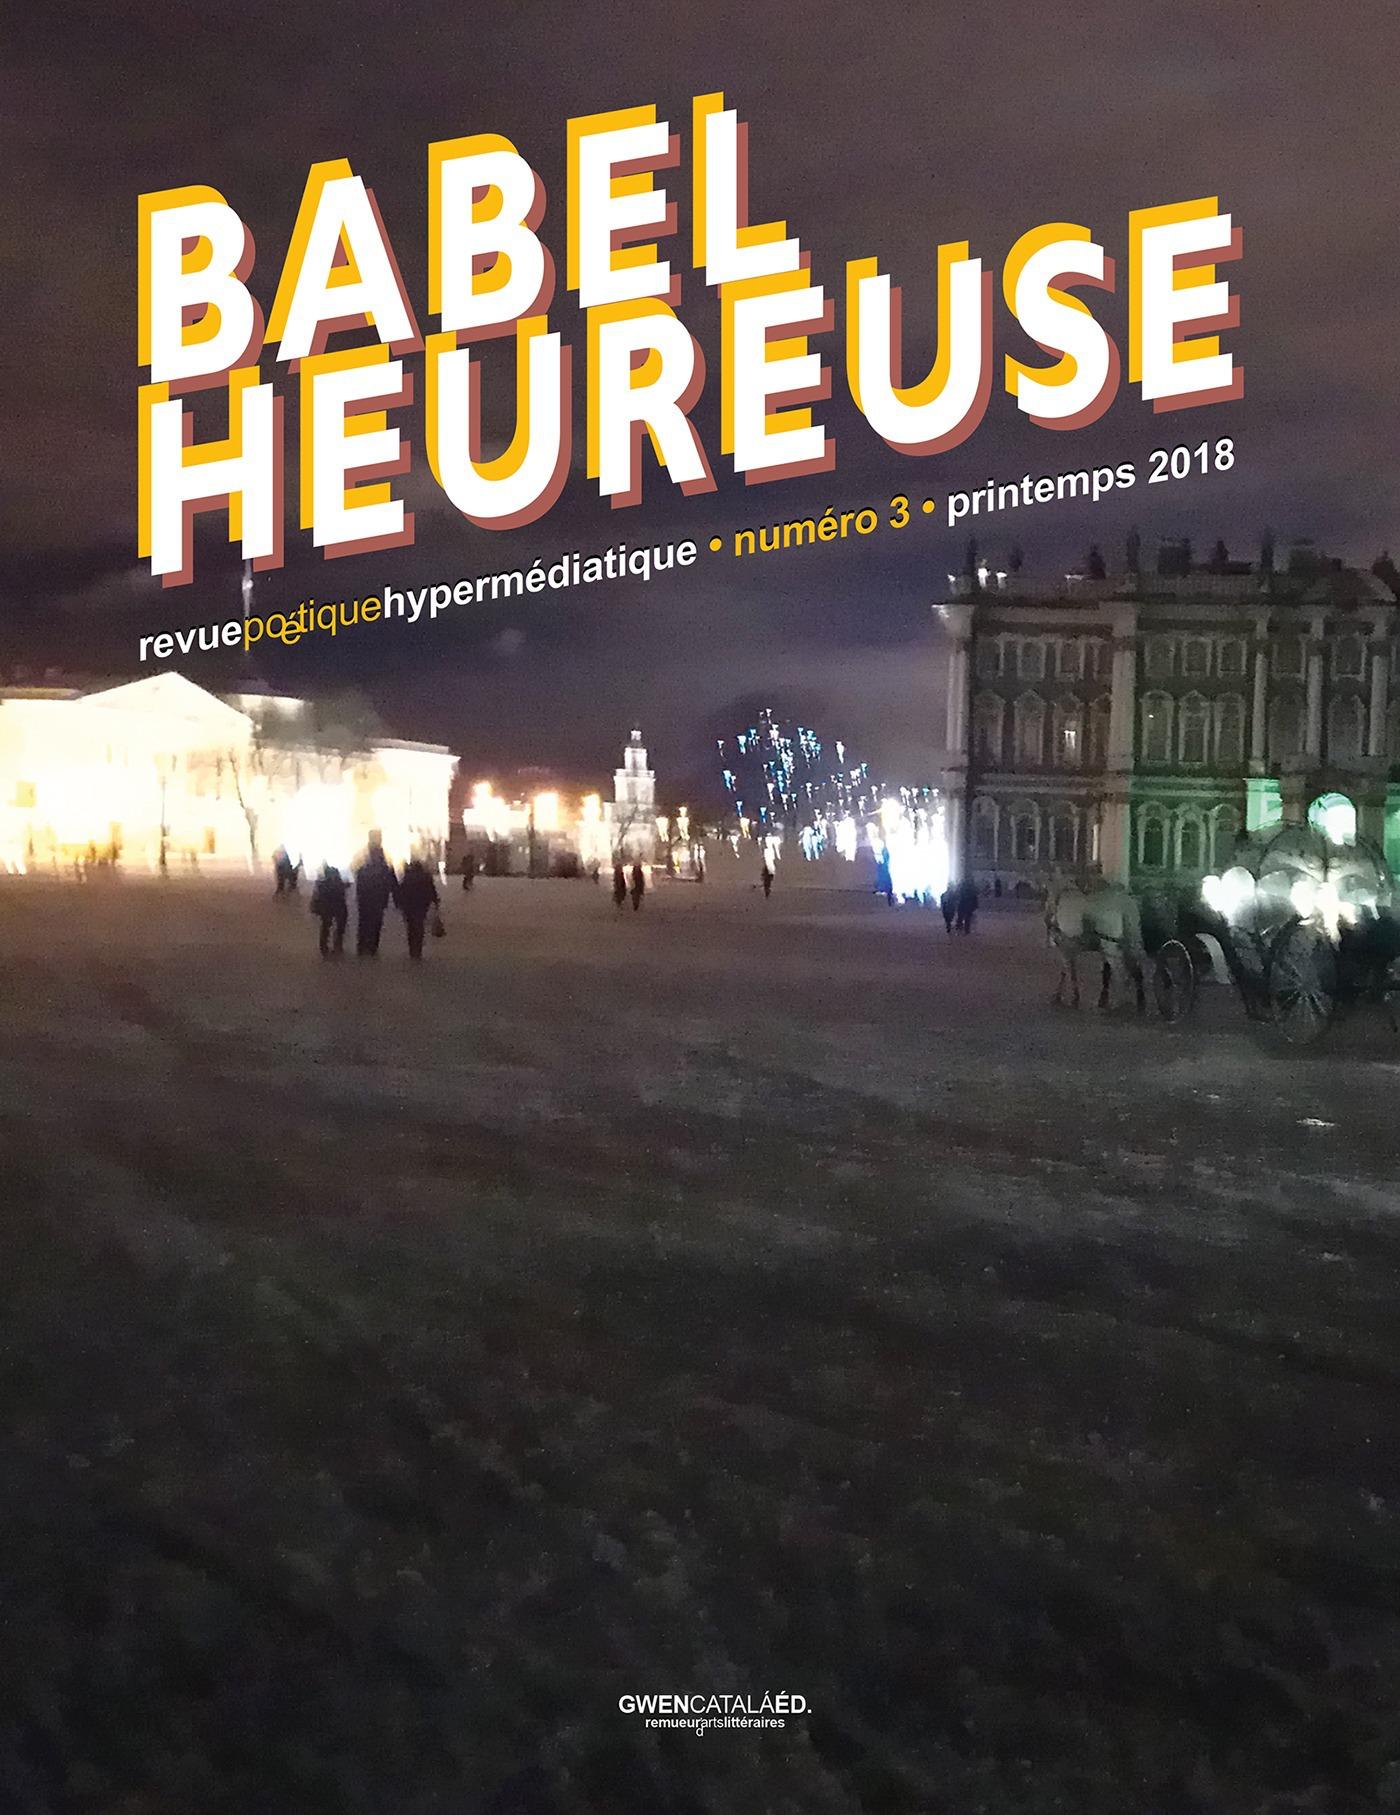 Babel heureuse t.3